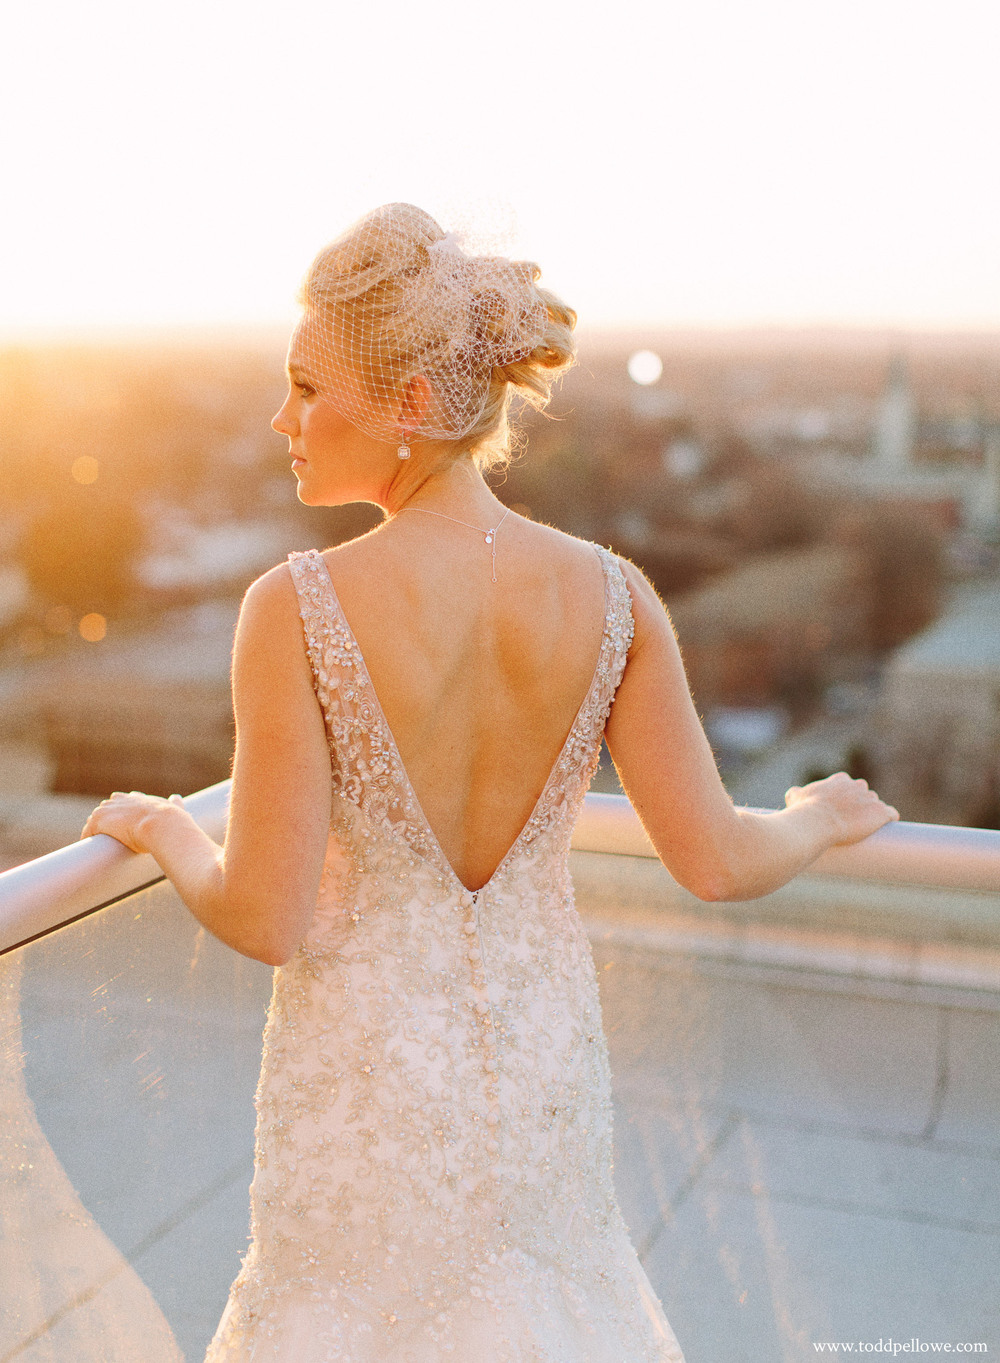 13-glassworks-wedding-photography-203.jpg